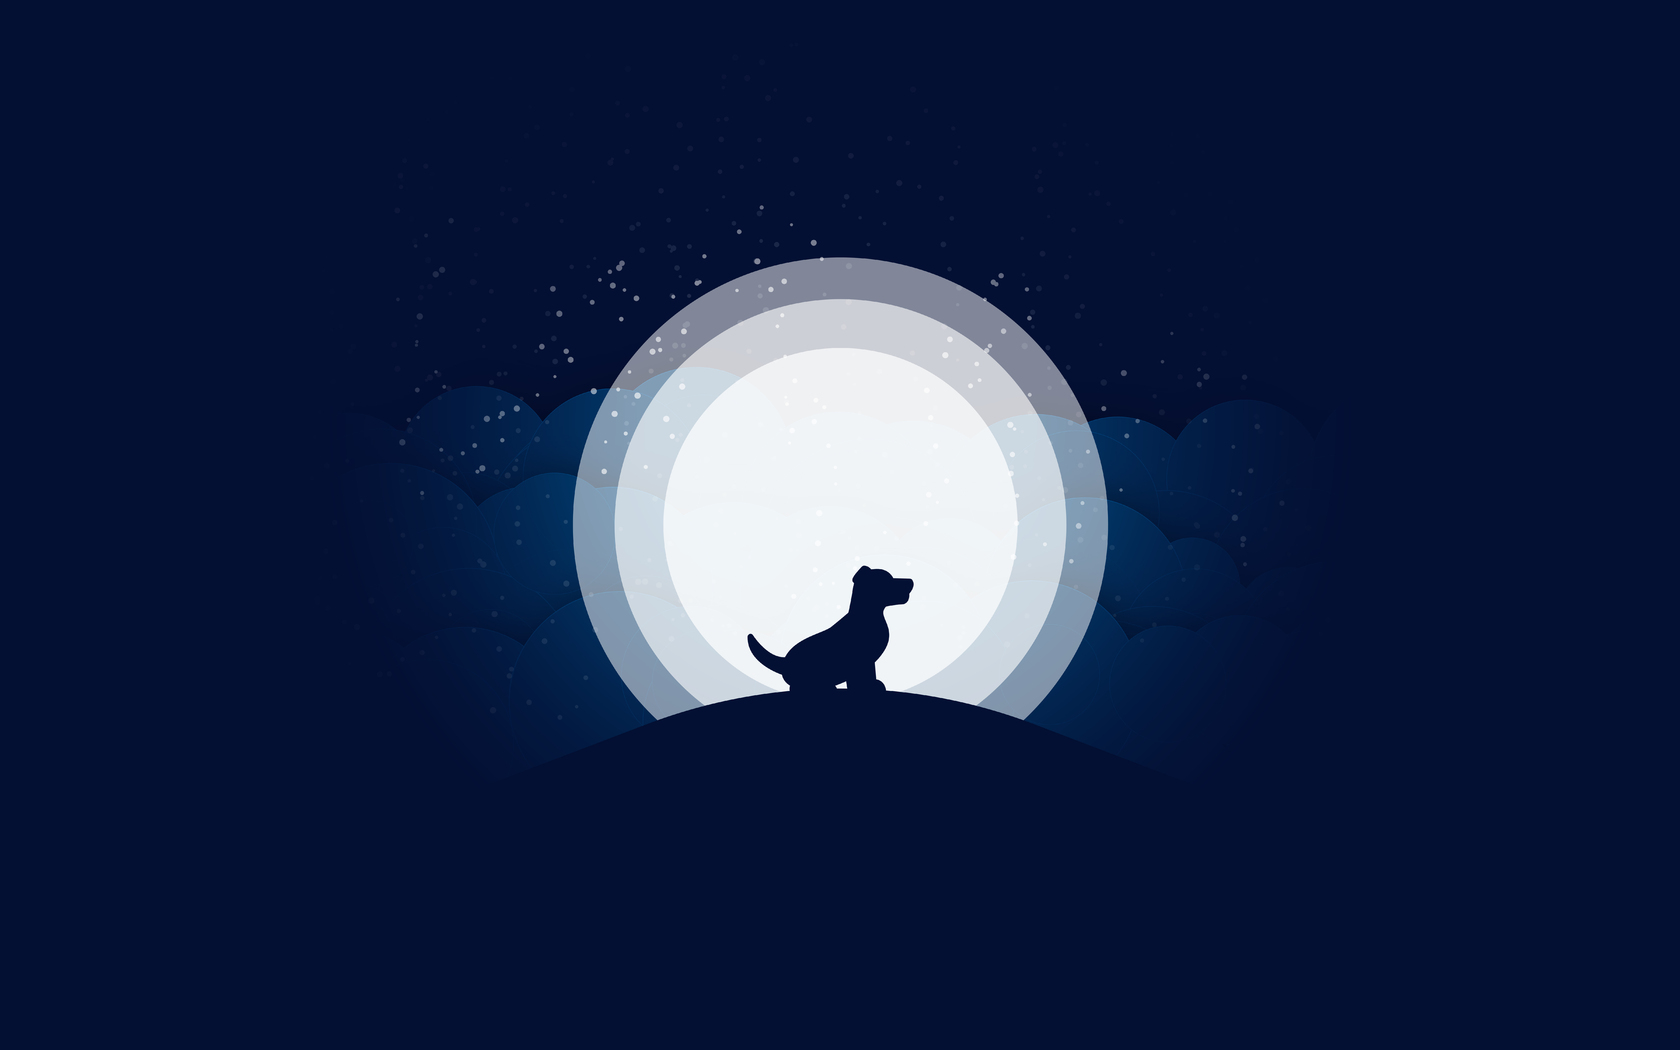 dog-moon-abstract-10k-l7.jpg